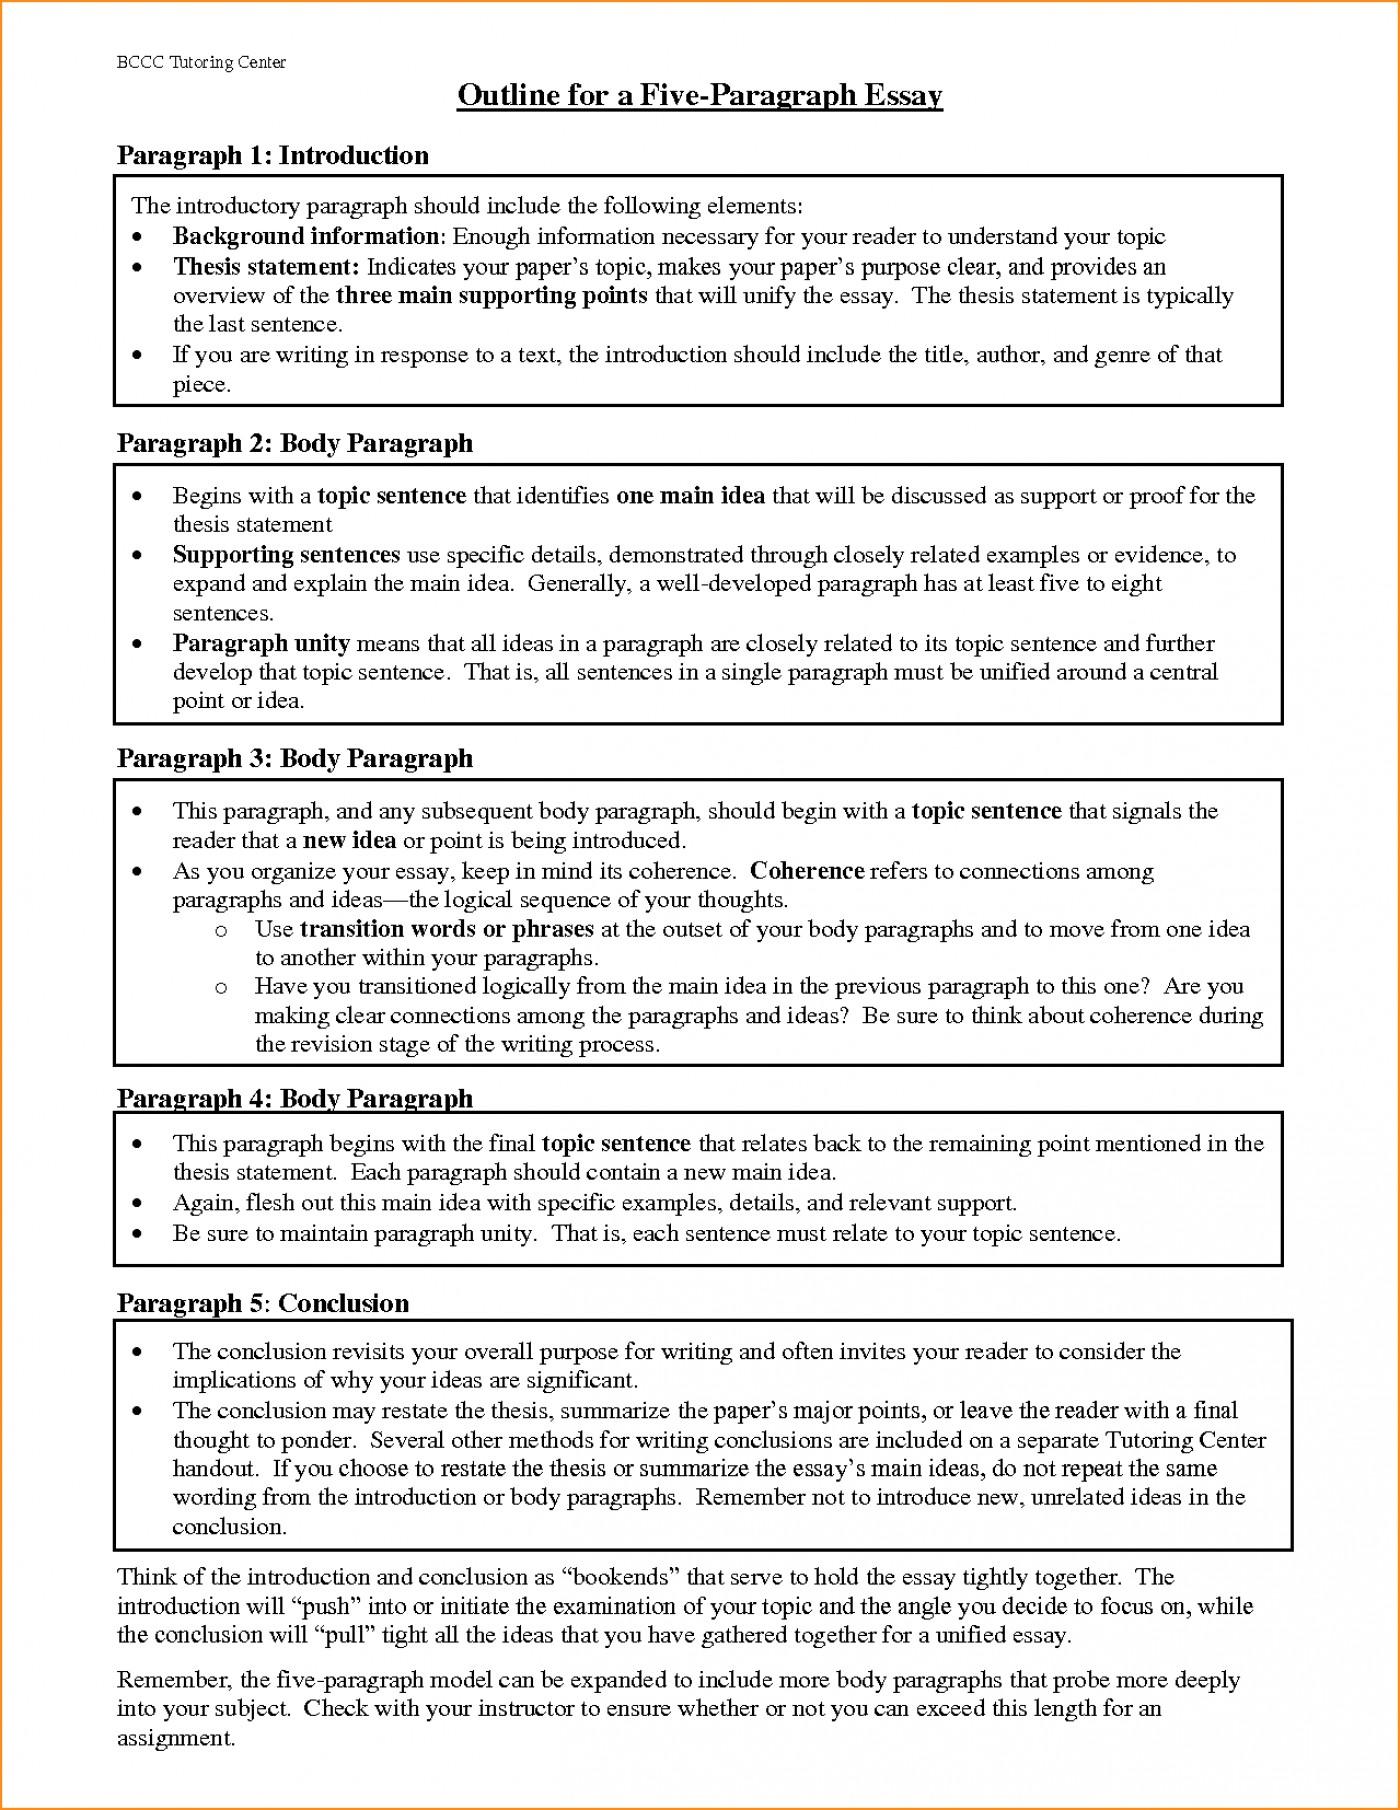 018 Paragraph Essay Outline Example Best Solutions Of Pdf Basic Job Appication Letter Cool Five Impressive 5 Template Argumentative 1400